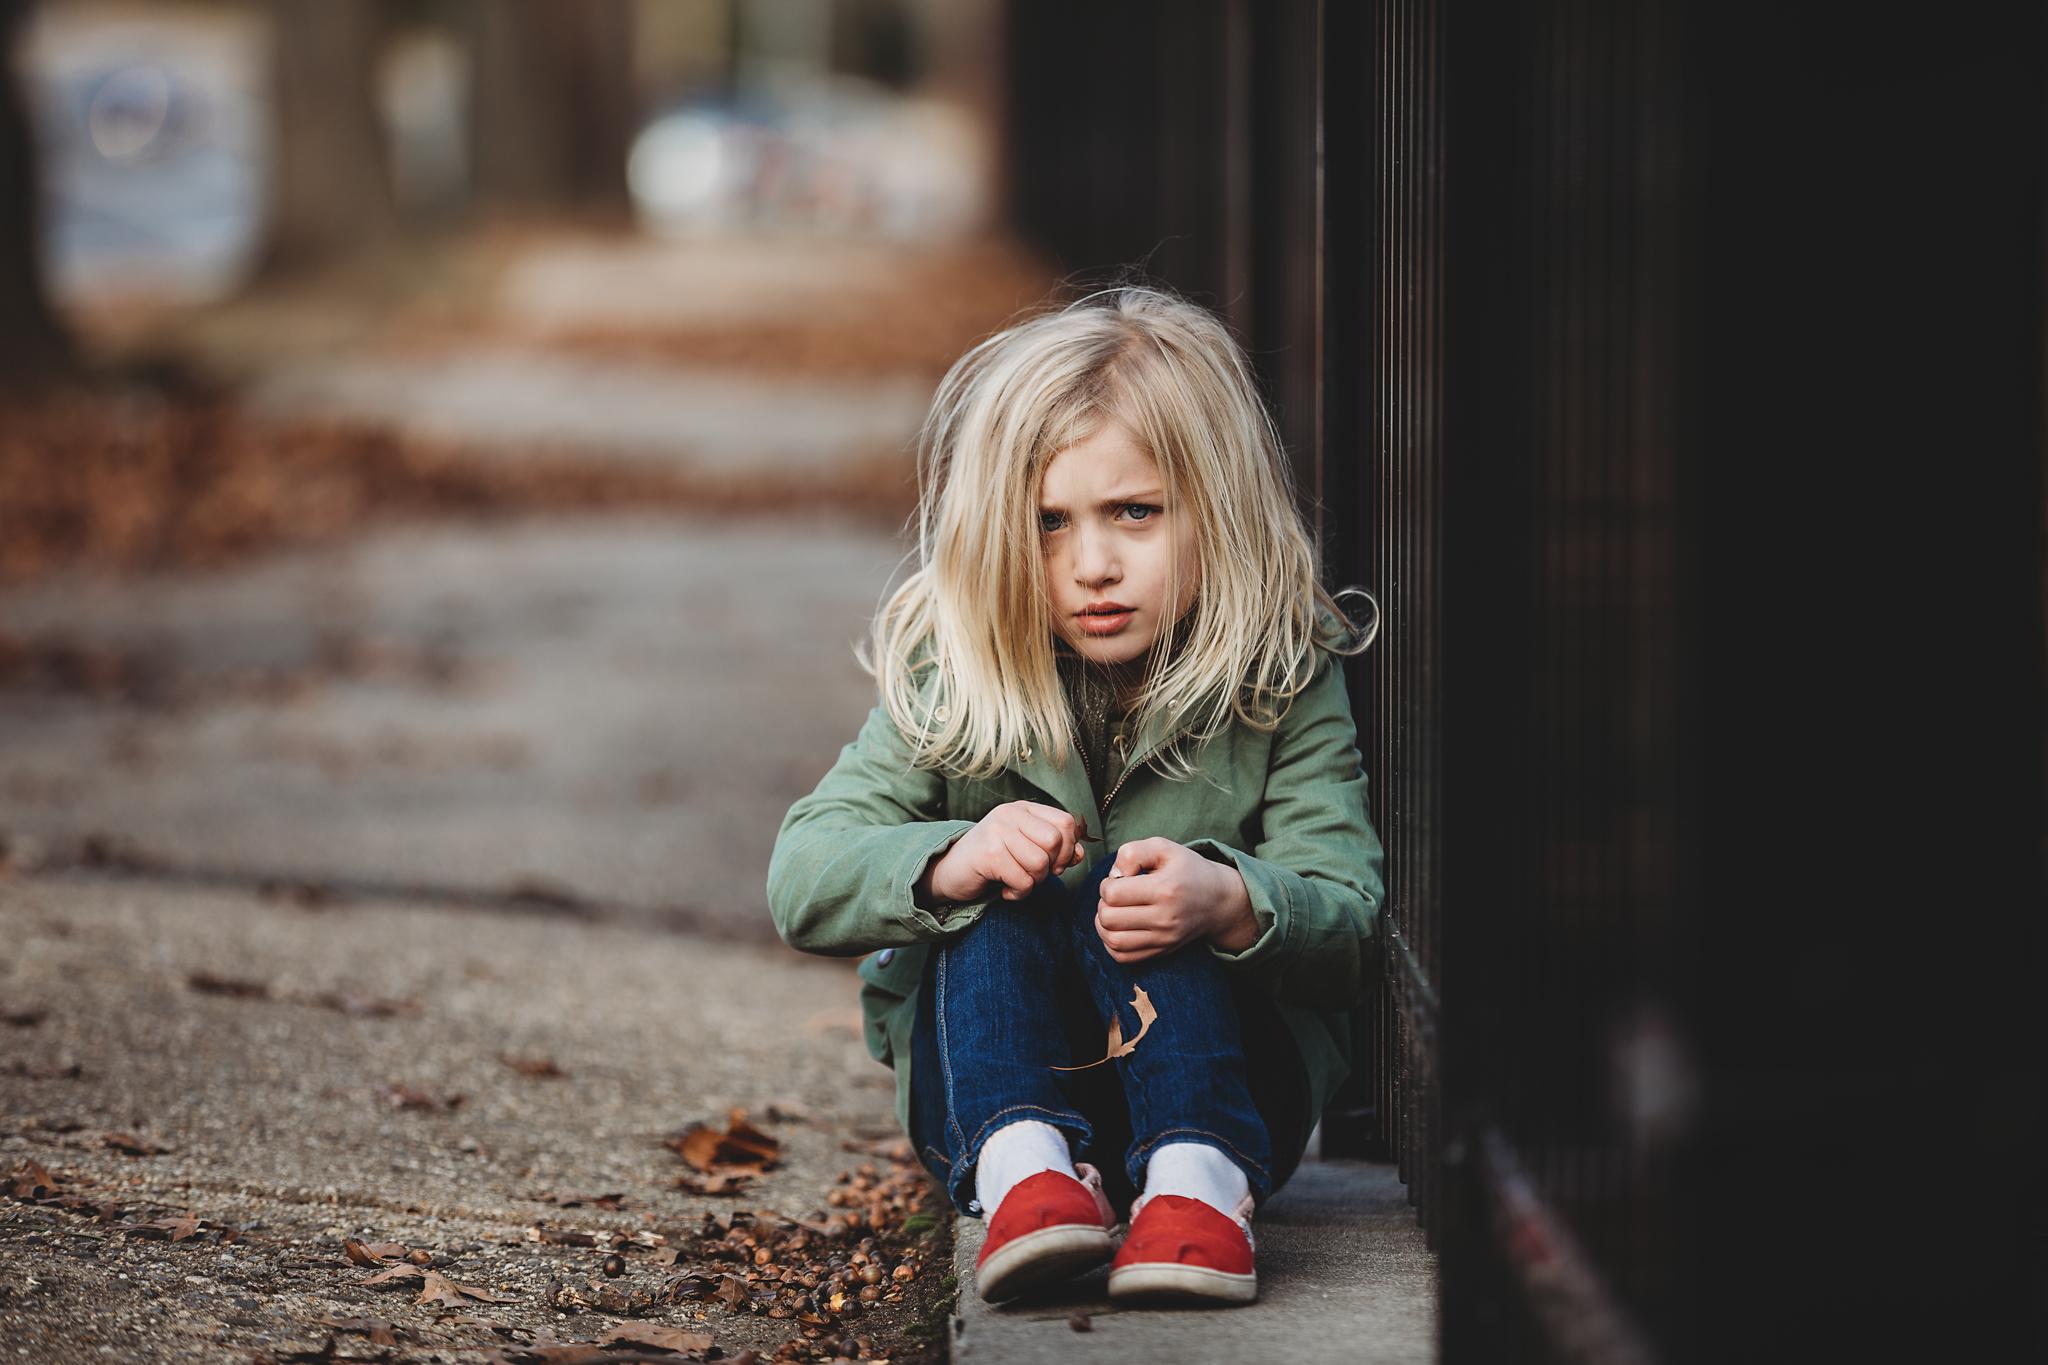 Long-island-photographer-hello-olivia-photography-children-kids-photos-new-york-lifestyle-portraits-suffolk-County-LI-13.jpg